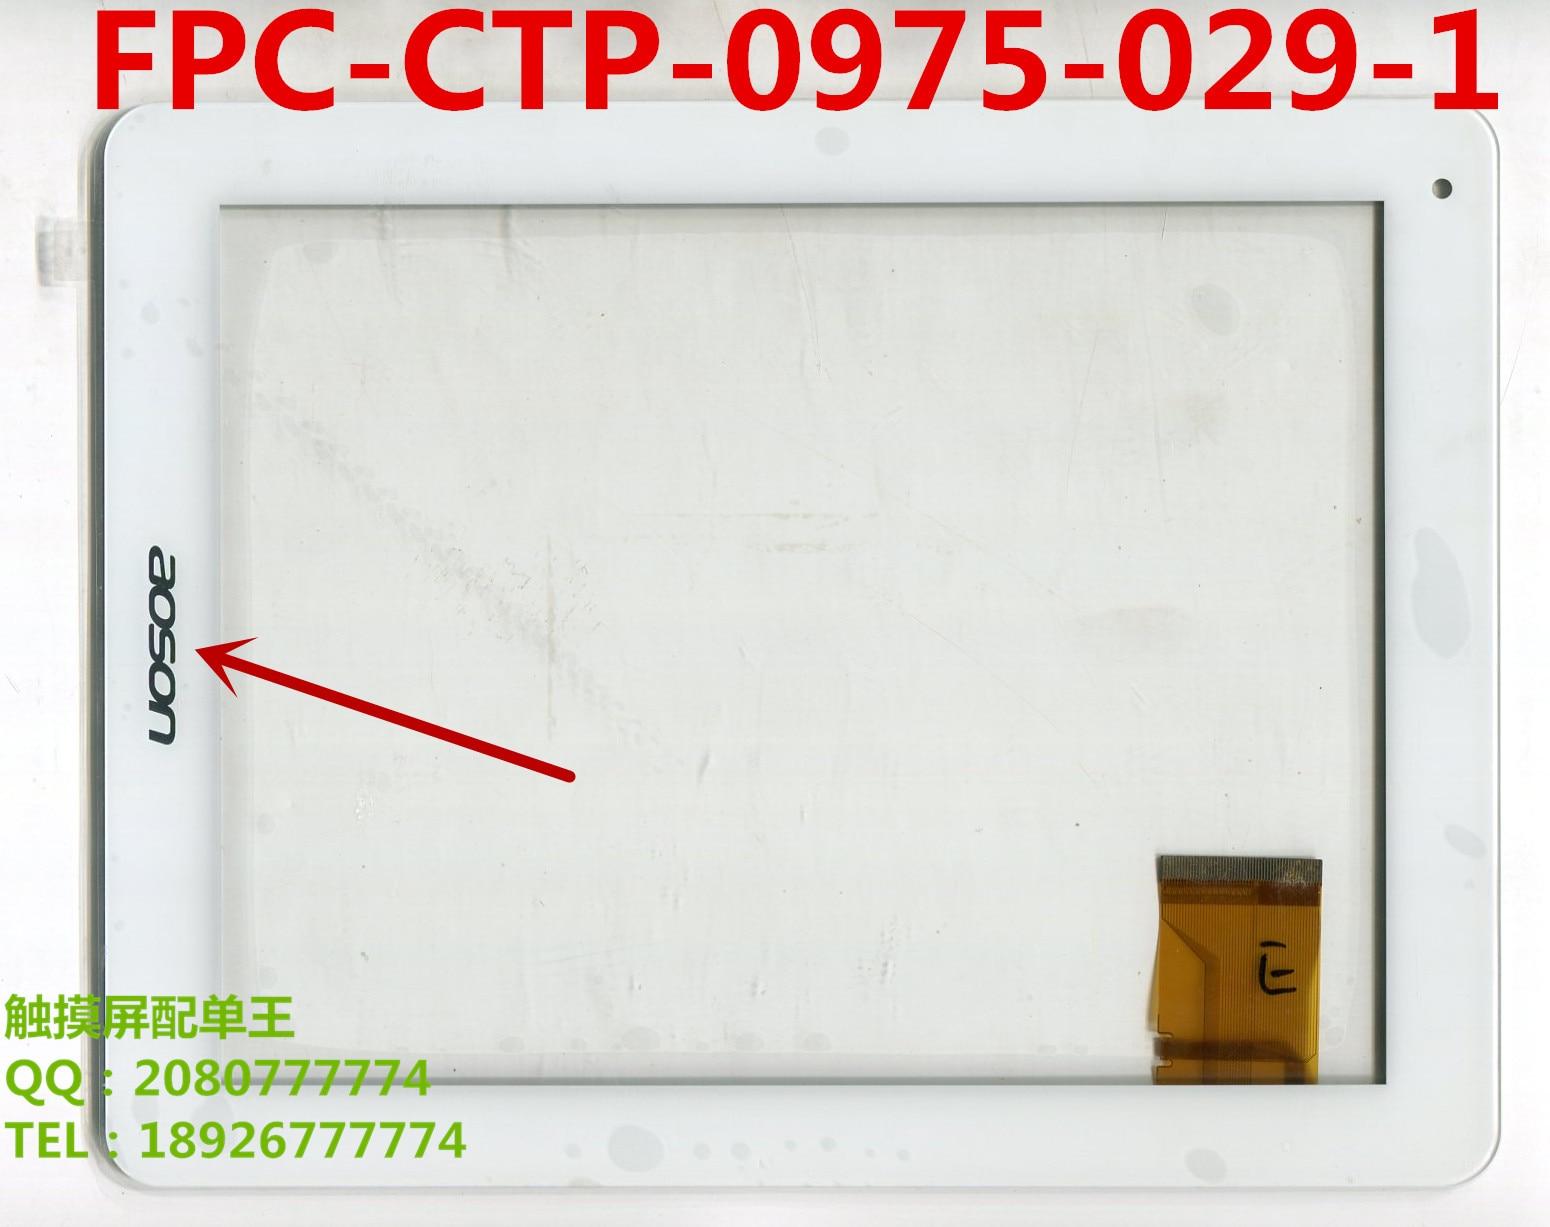 ¡9,7 pulgadas táctil panel de cristal para pantalla FPC-CTP-0975-029-1 FPC-CTP-0975-029-4 para 3Q Qoo! Surf LC9704A tablet pc